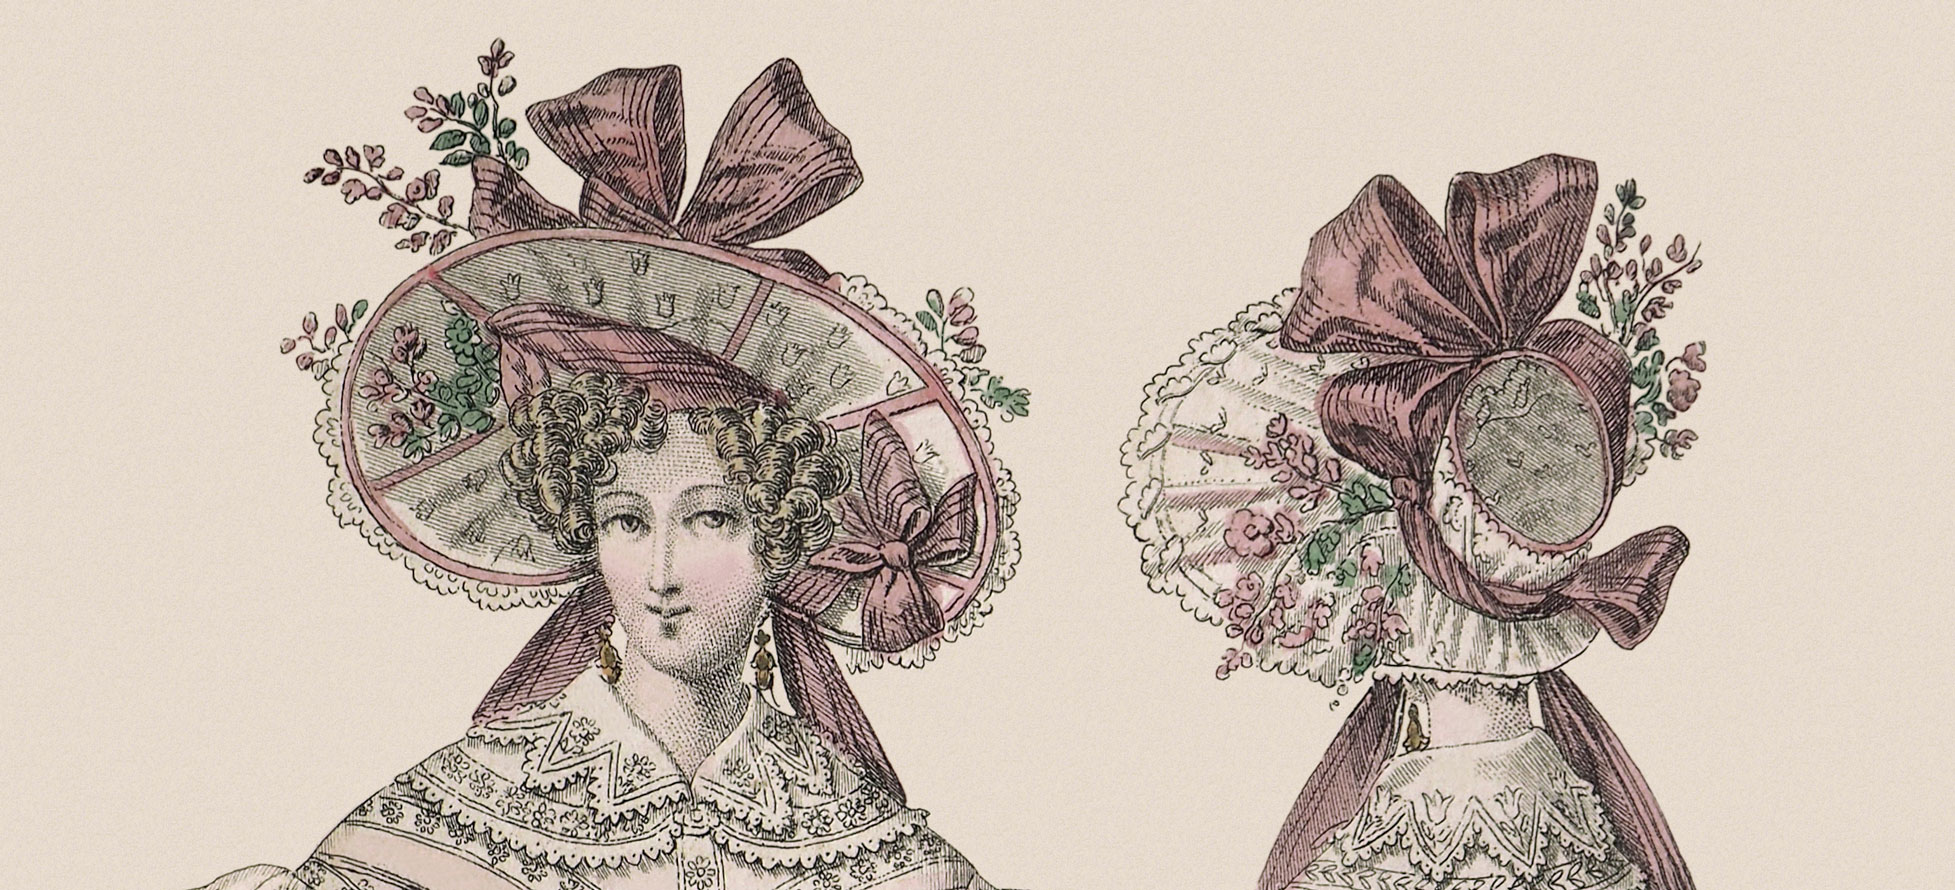 https://ufe-experts.fr/wp-content/uploads/2019/08/journal-des-dames-et-des-modes-1830-planche-n°-2800-copyright-Guénolée-Milleret.jpg